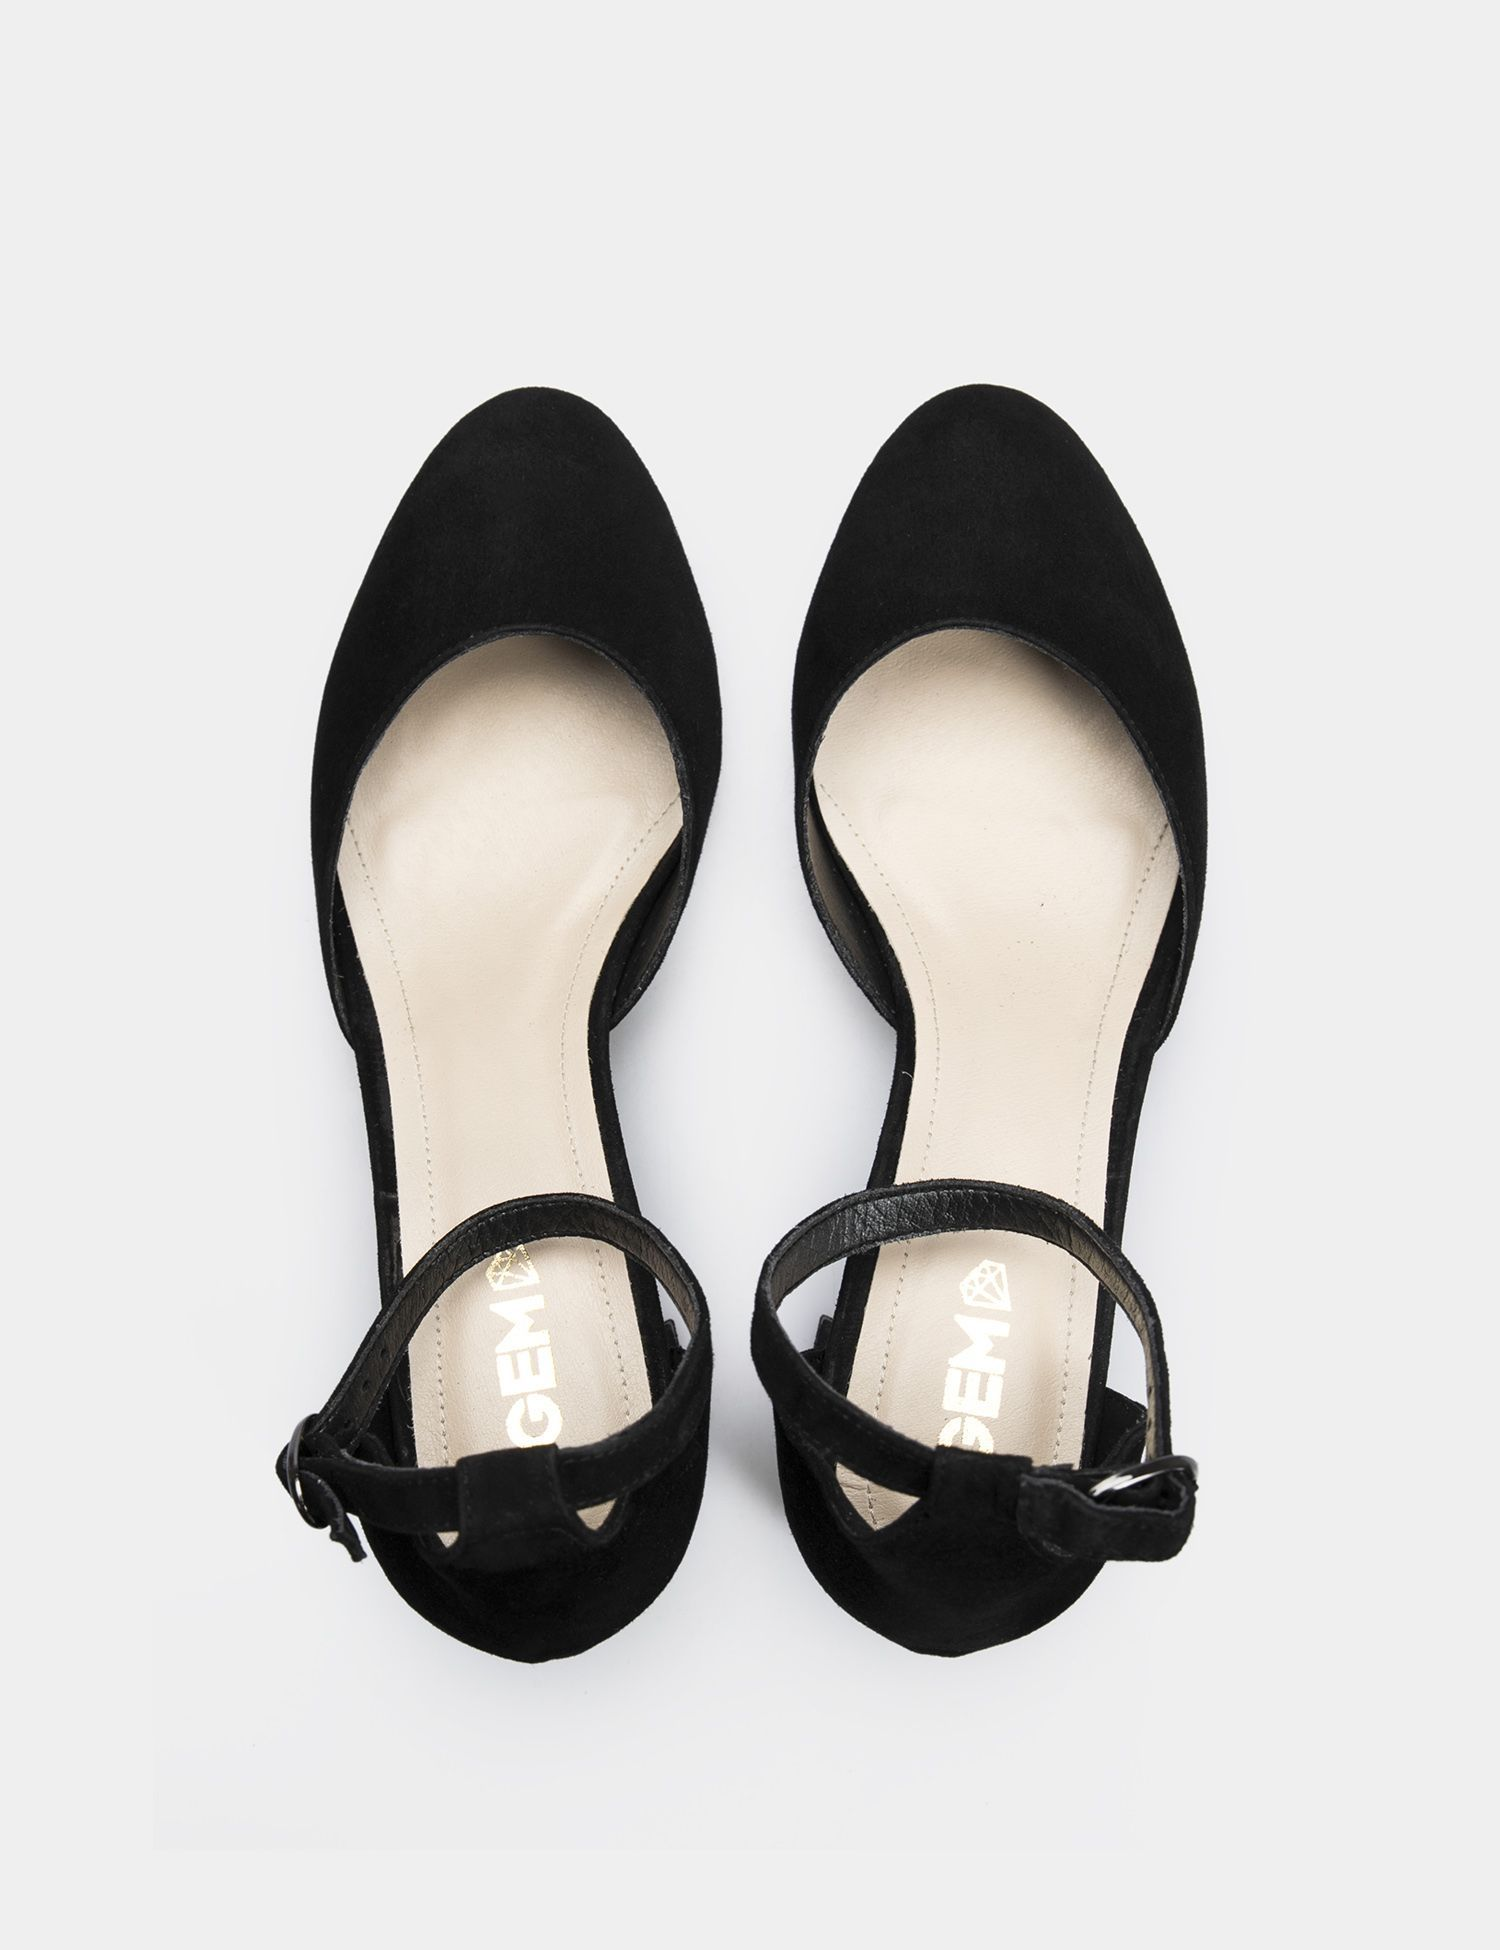 Босоножки женские Босоножки 61890149 черная замша 61890149 цена, 2017